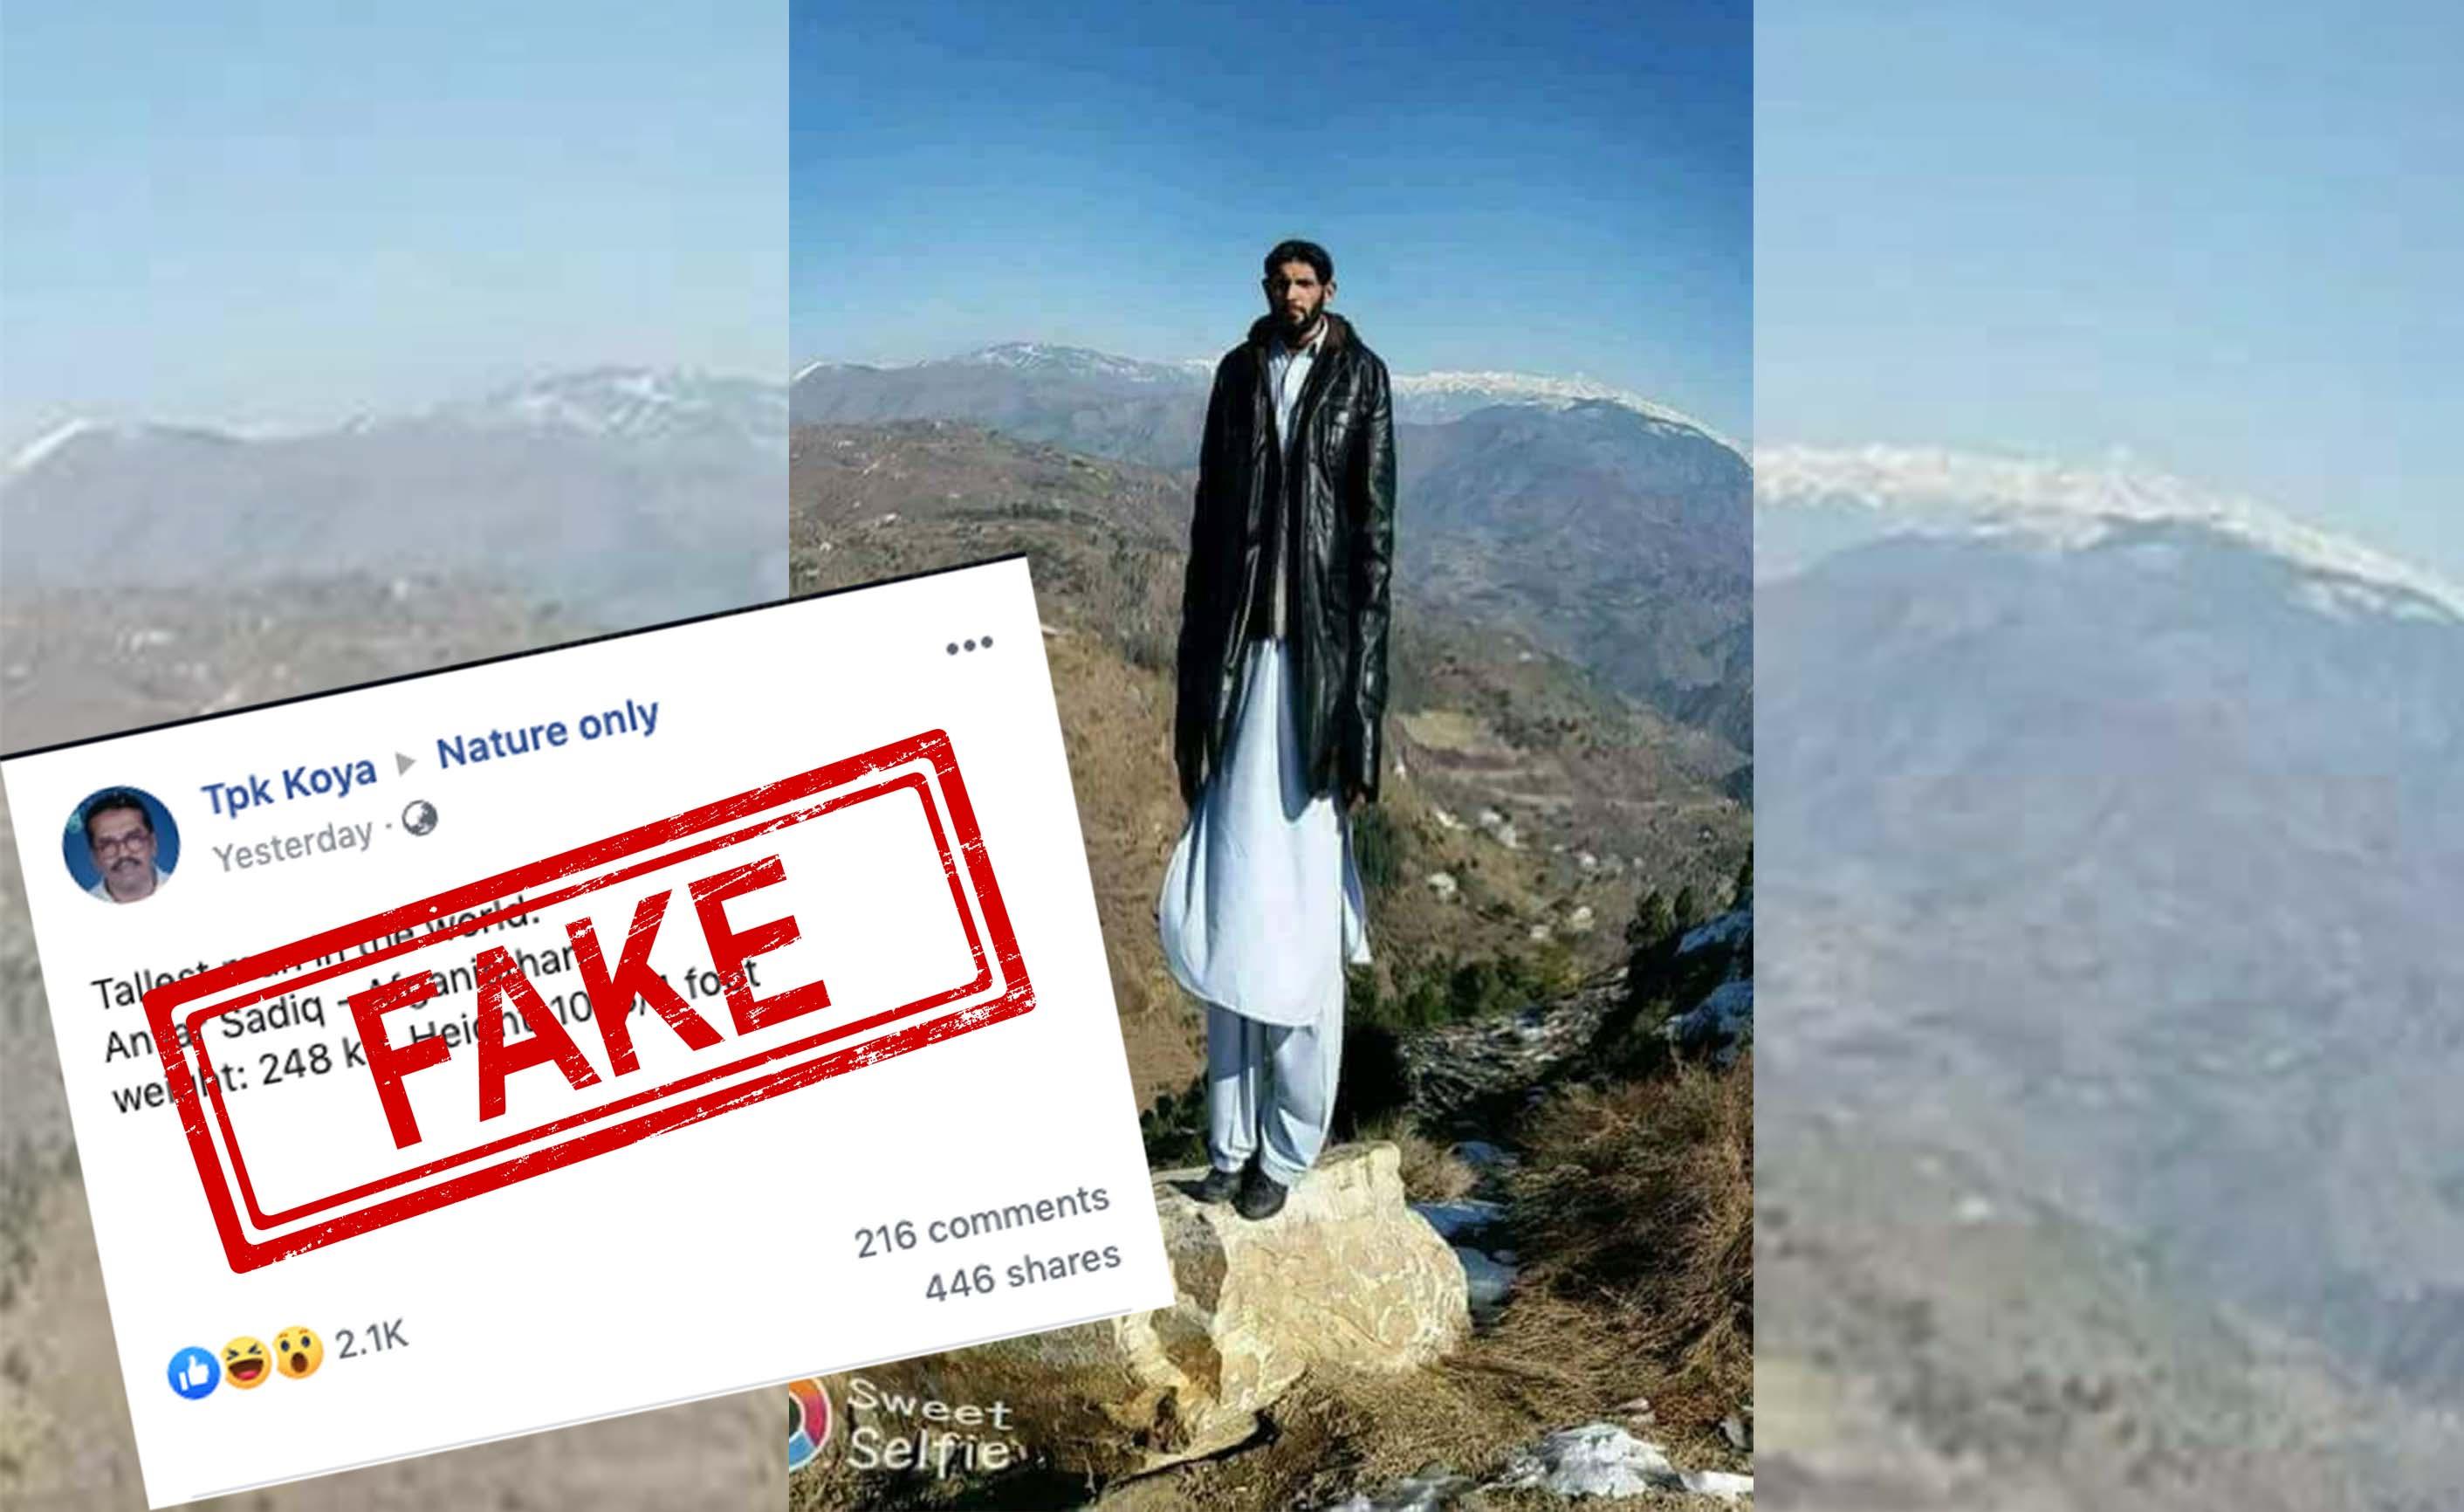 Tallest Man, Picture, NewsMoible, Mobile, News, 10 feet, Fact Check, Fact Checker, FAKE